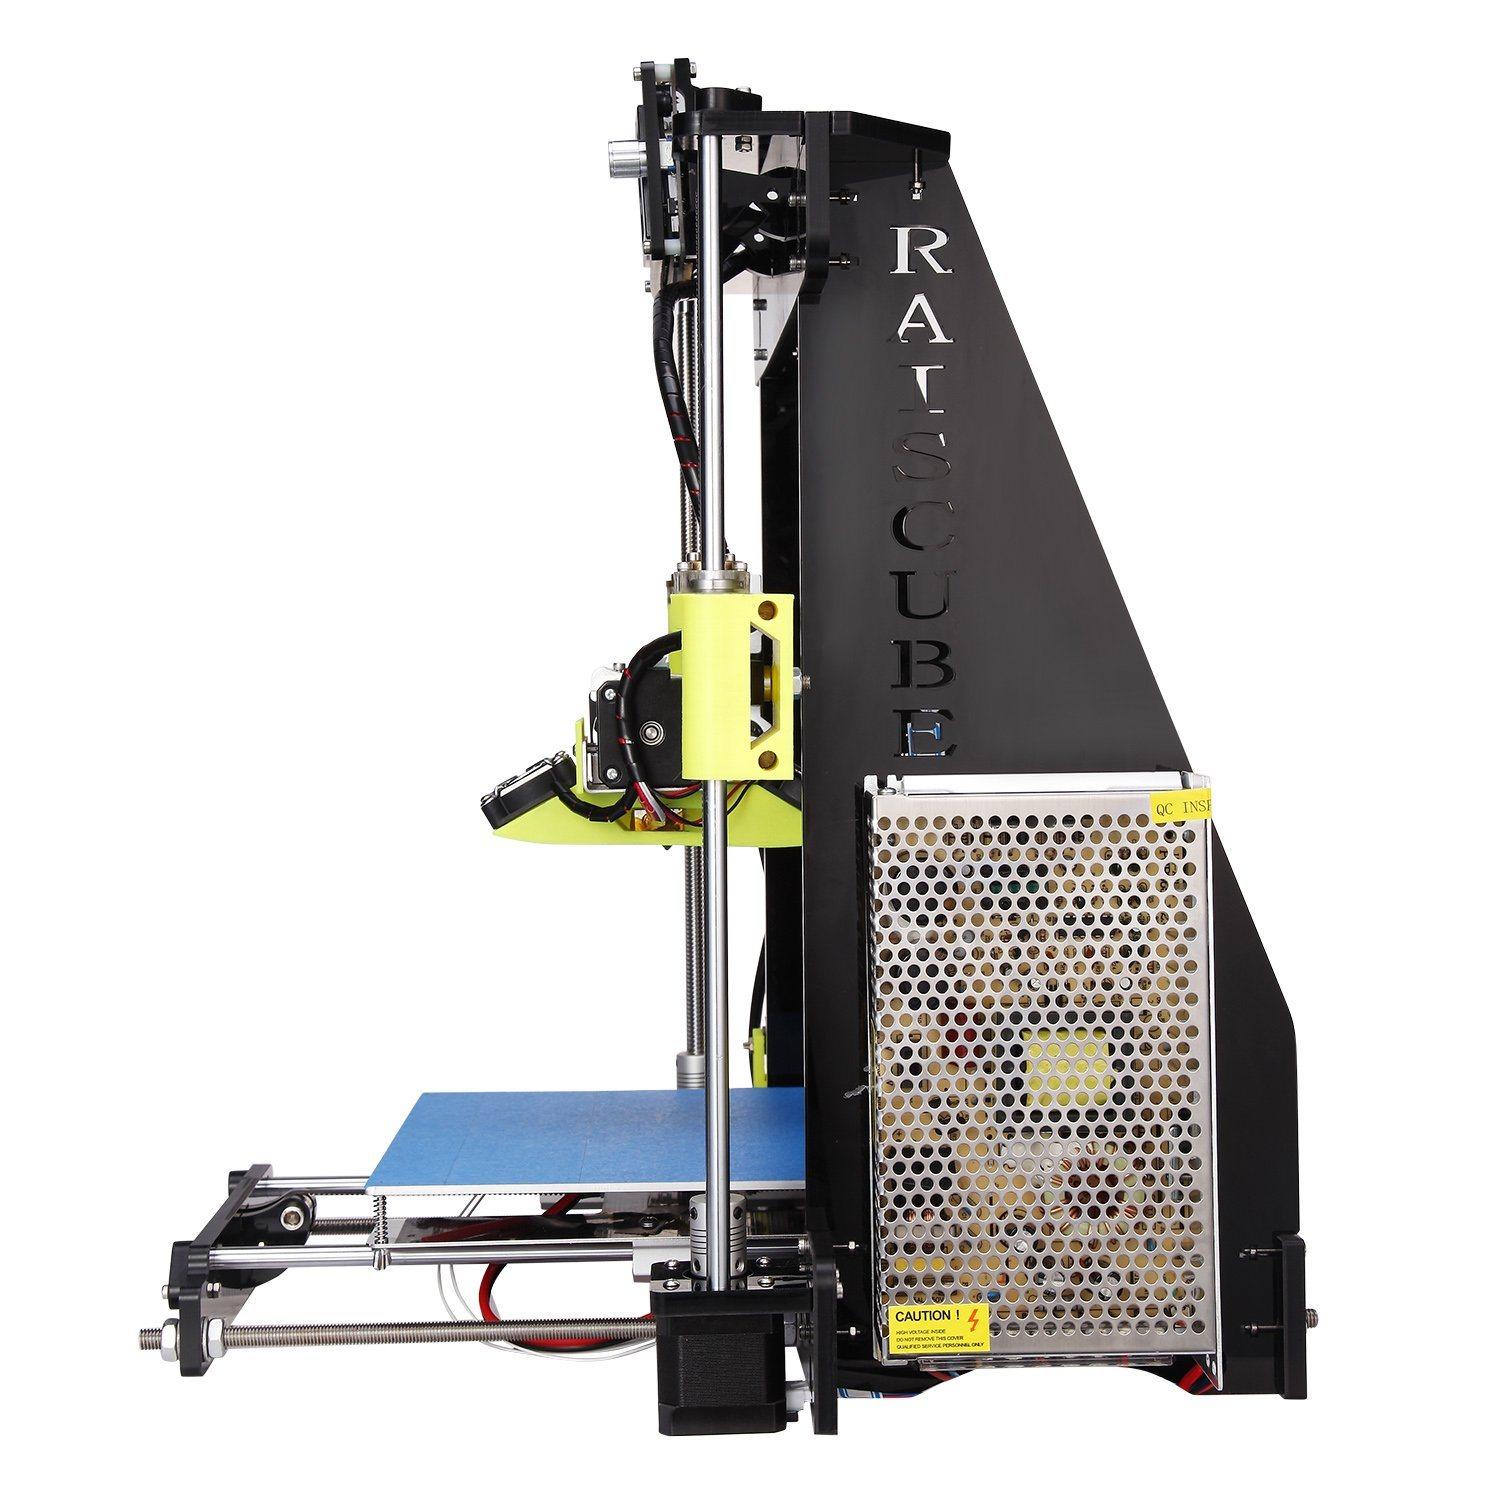 Raiscube High Performance Reprap Prusa I3 FDM Desktop 3D Printer